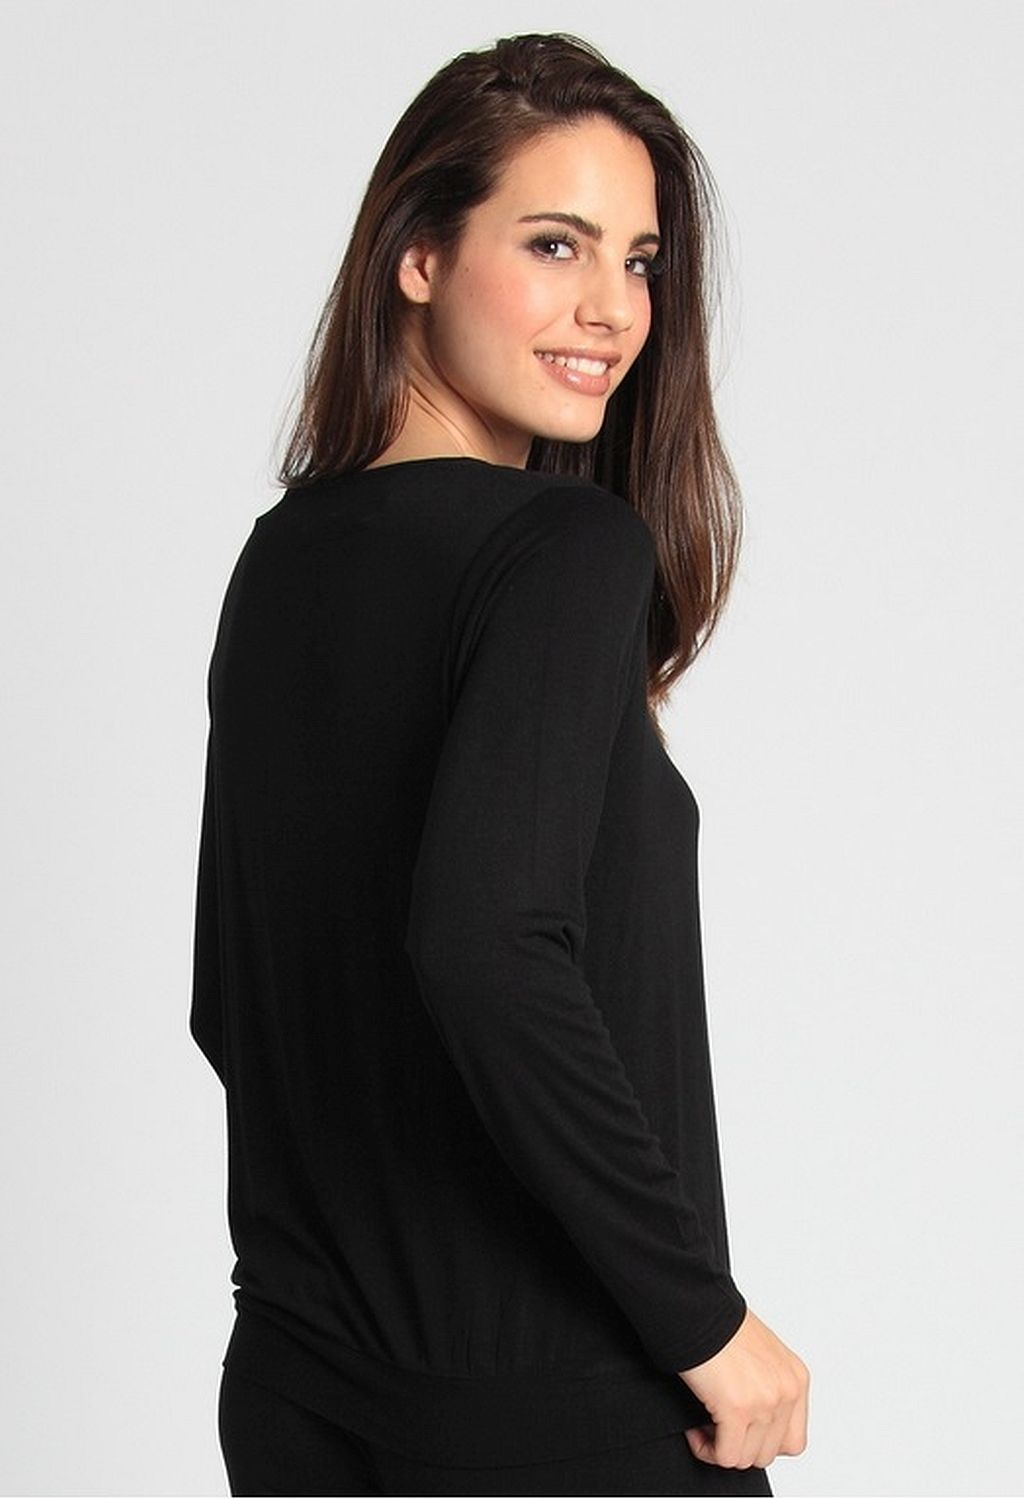 Sassa Damen Nachthemd Shirt Casual Comfort schwarz Viskose Gr 36 - 46